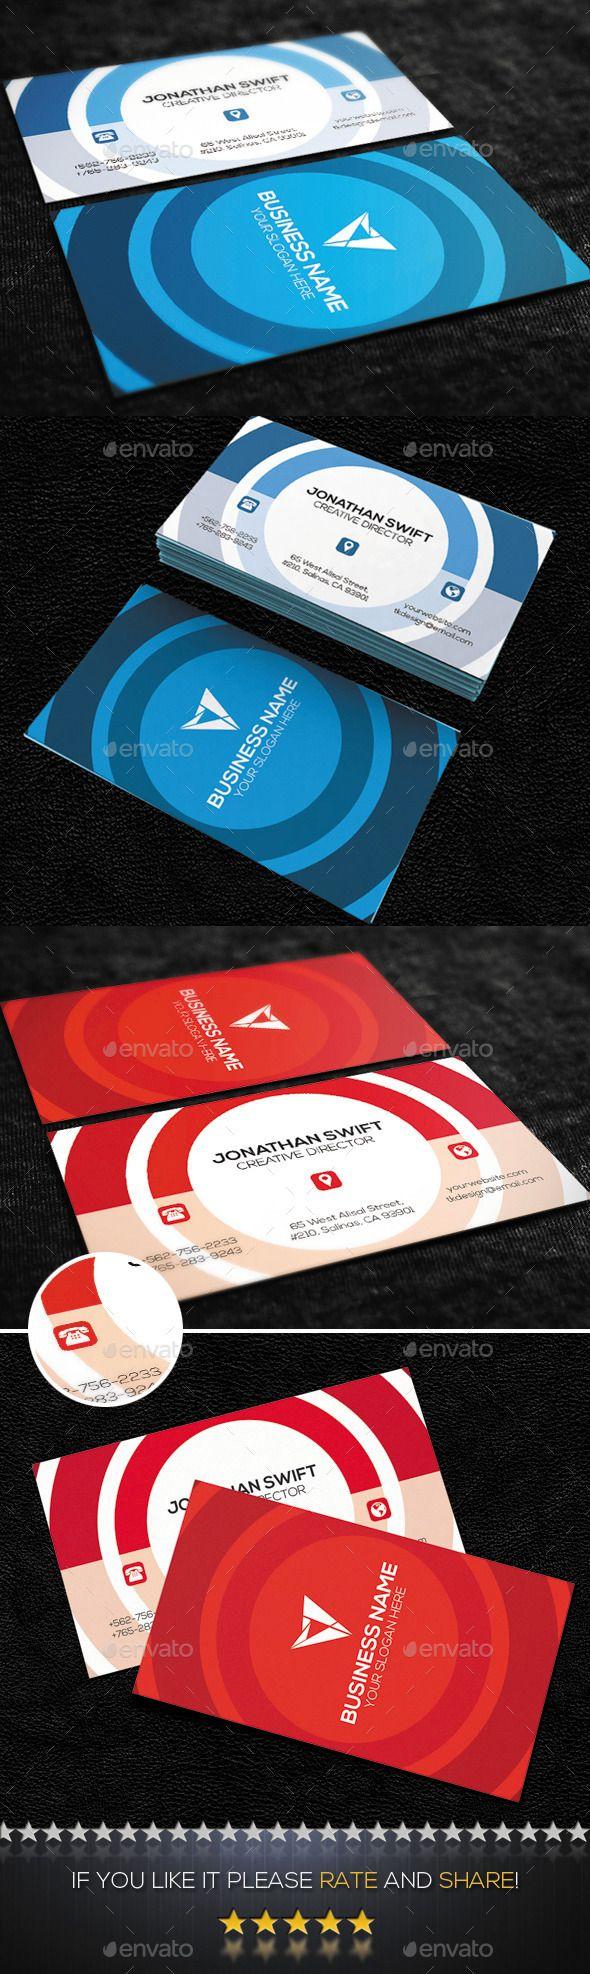 Creative Business Card #design Download: http://graphicriver.net/item/creative-business-card-no06/9105578?ref=ksioks